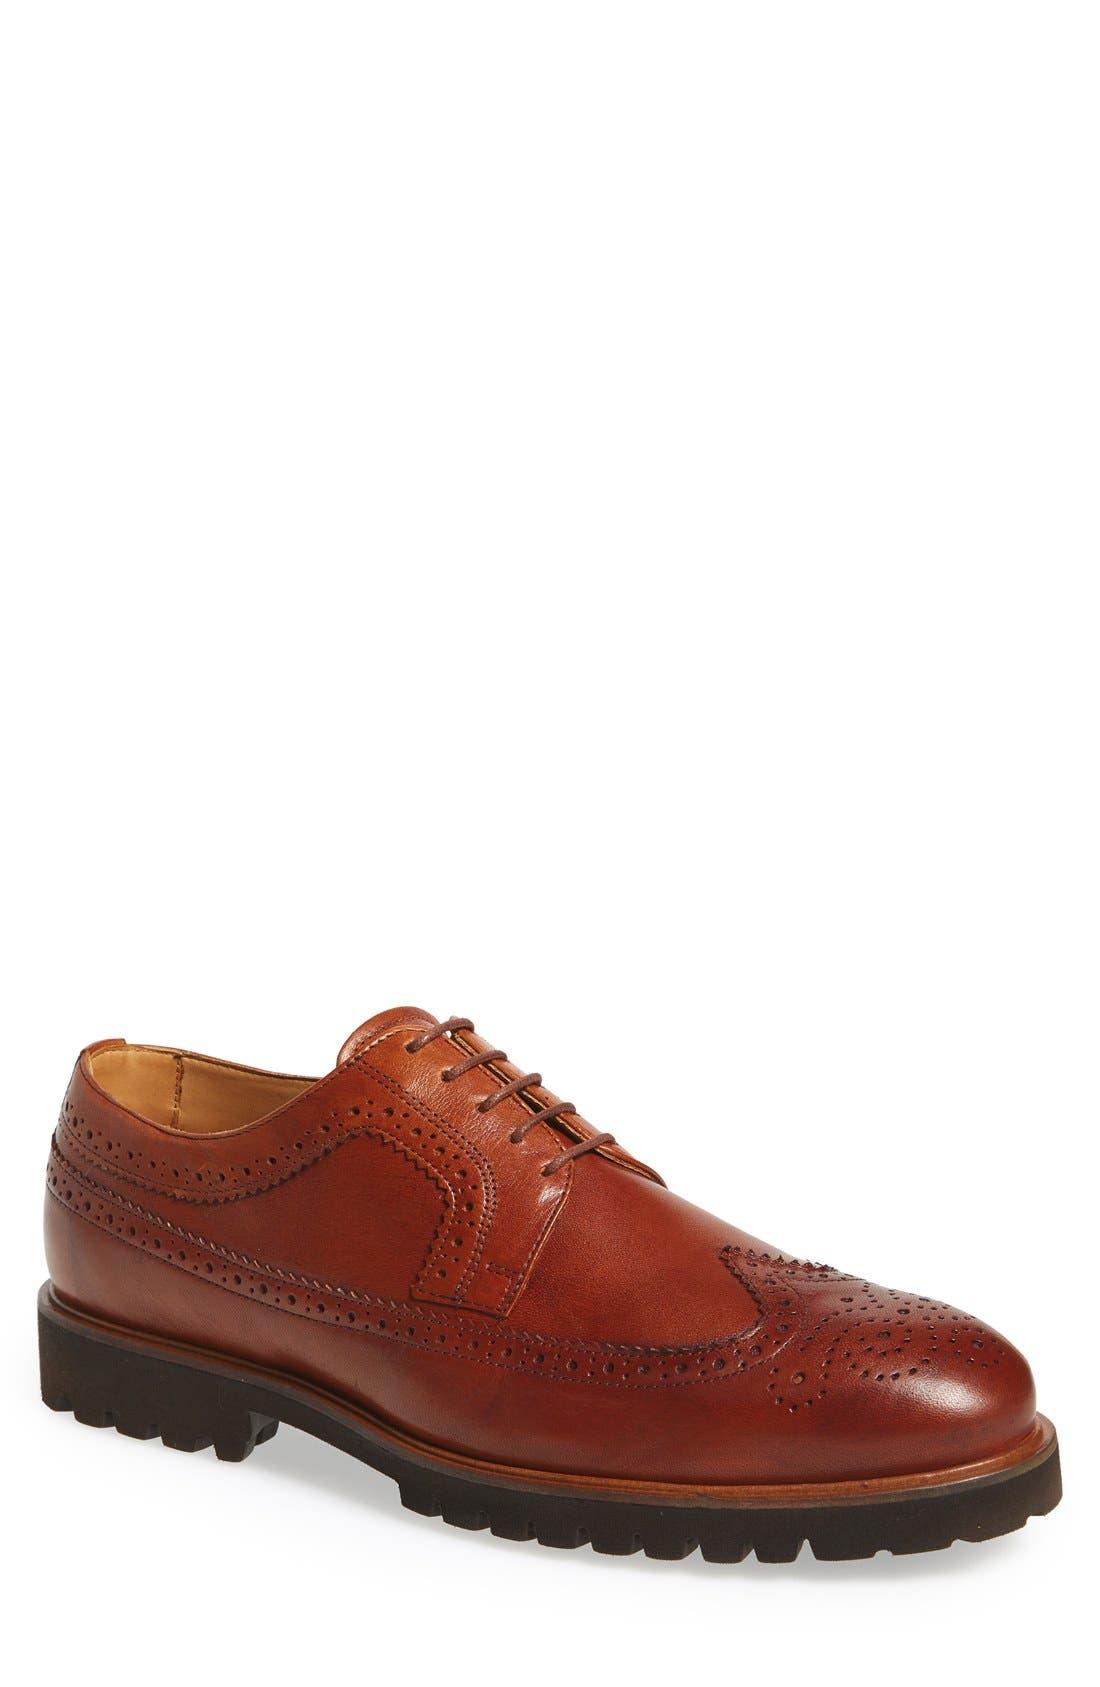 'Loven' Wingtip Derby,                             Main thumbnail 1, color,                             Cognac Leather